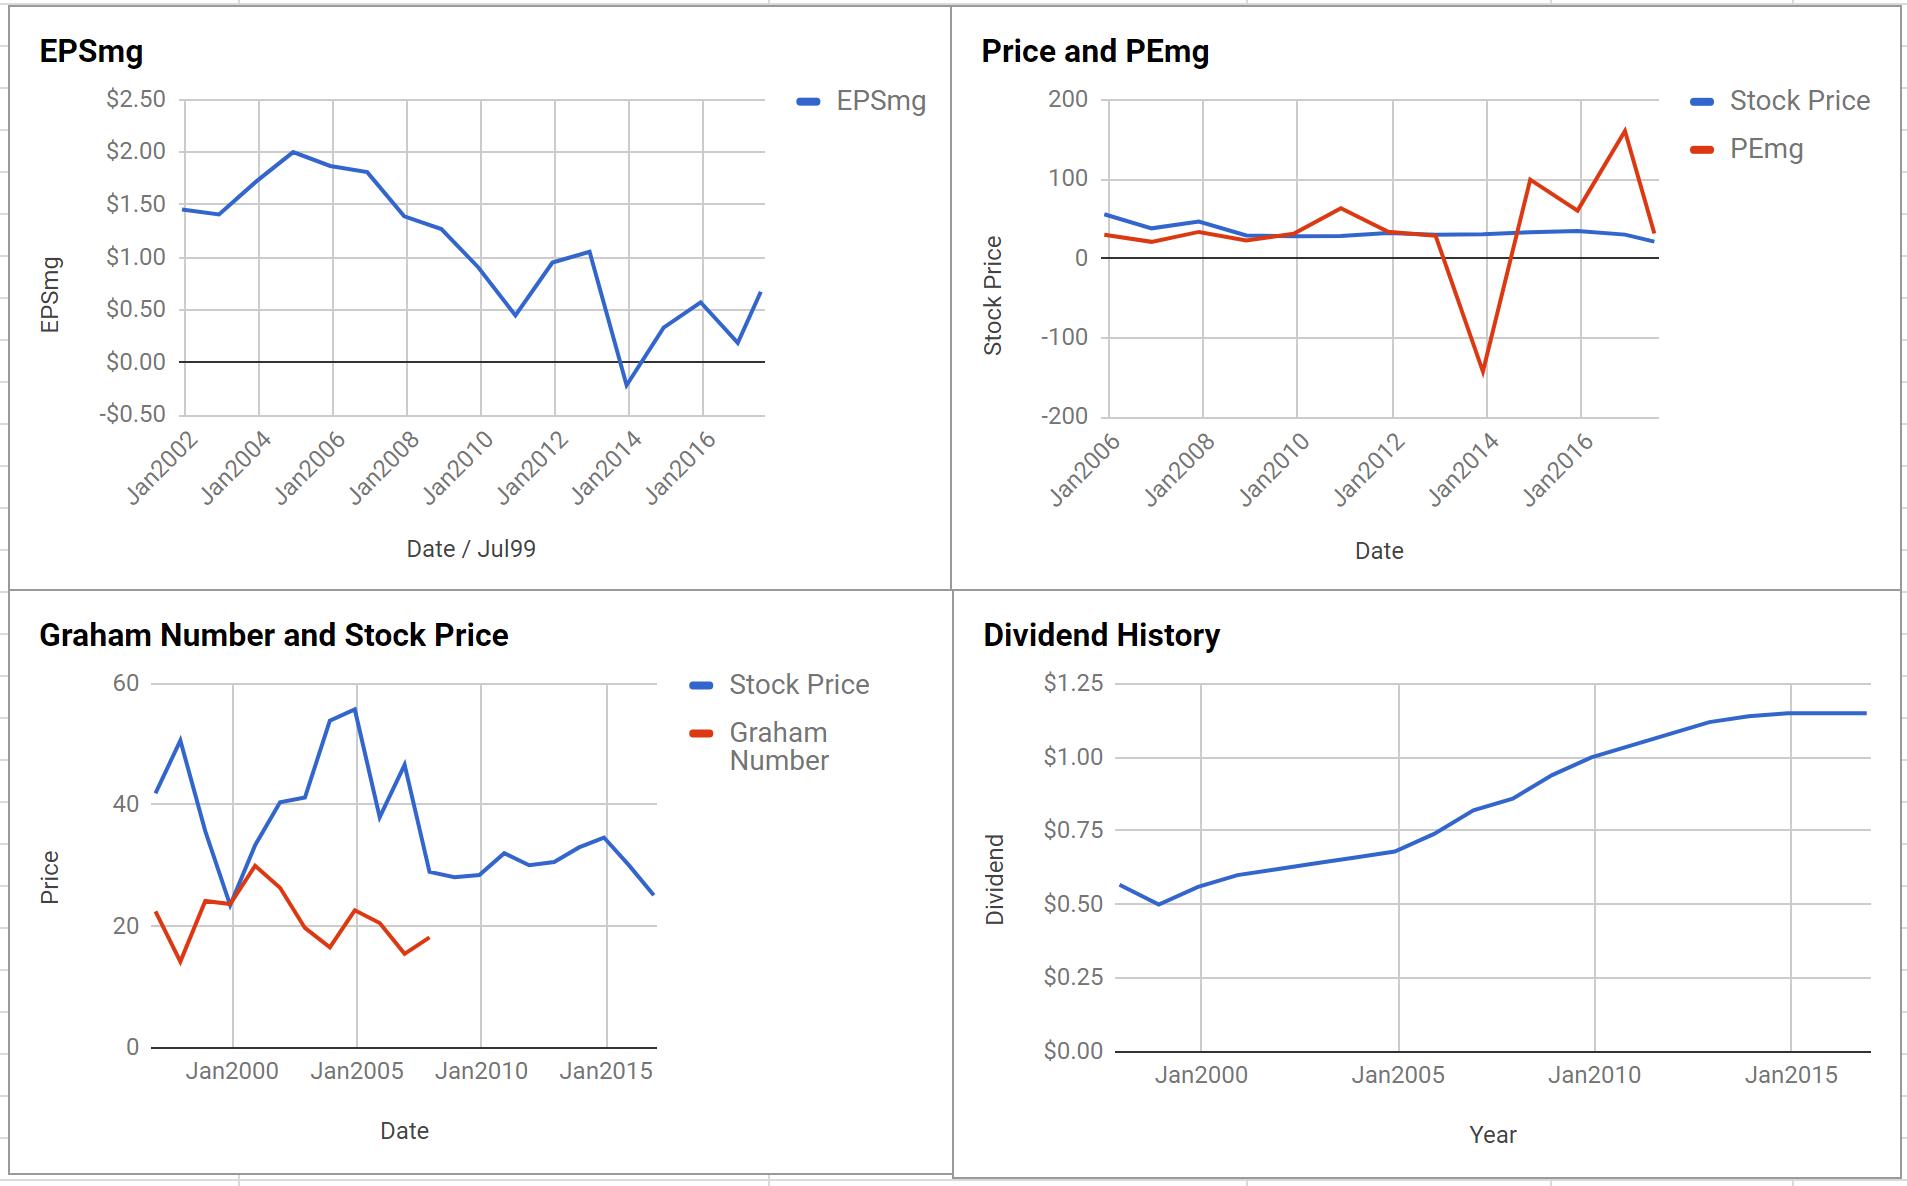 Diebold Nixdorf Inc Valuation – Initial Coverage $DBD